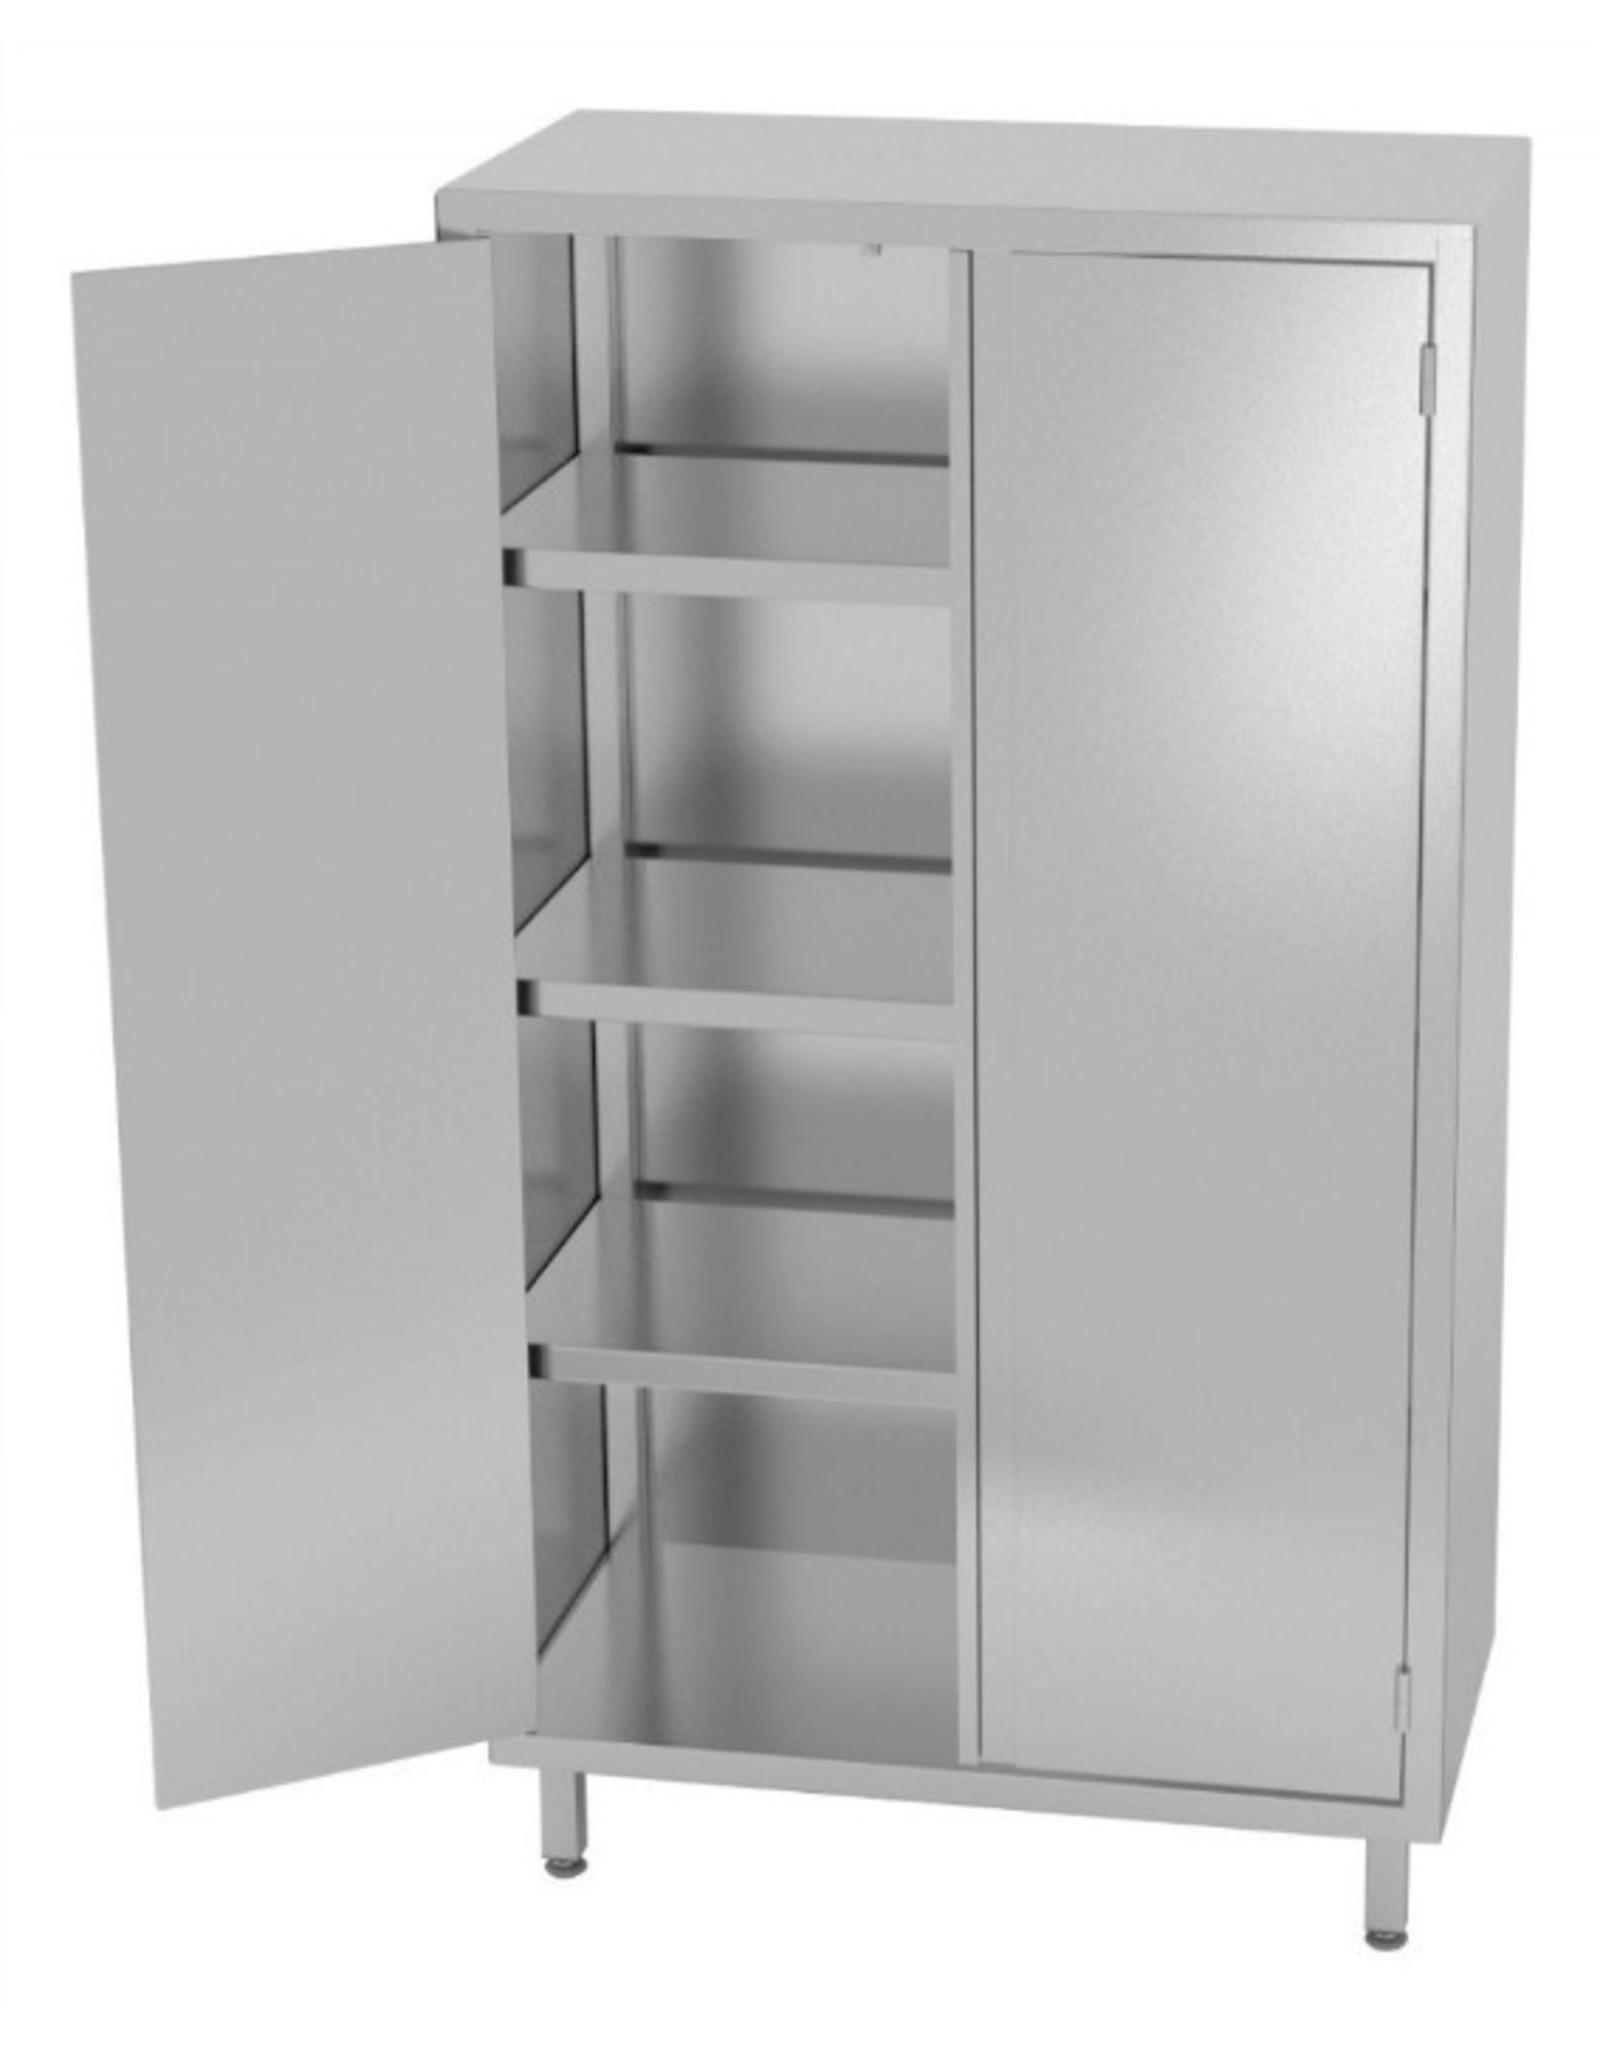 Kast met dubbele klapdeuren | 700-1200mm breed | 500-700mm diep | 1800mm hoog